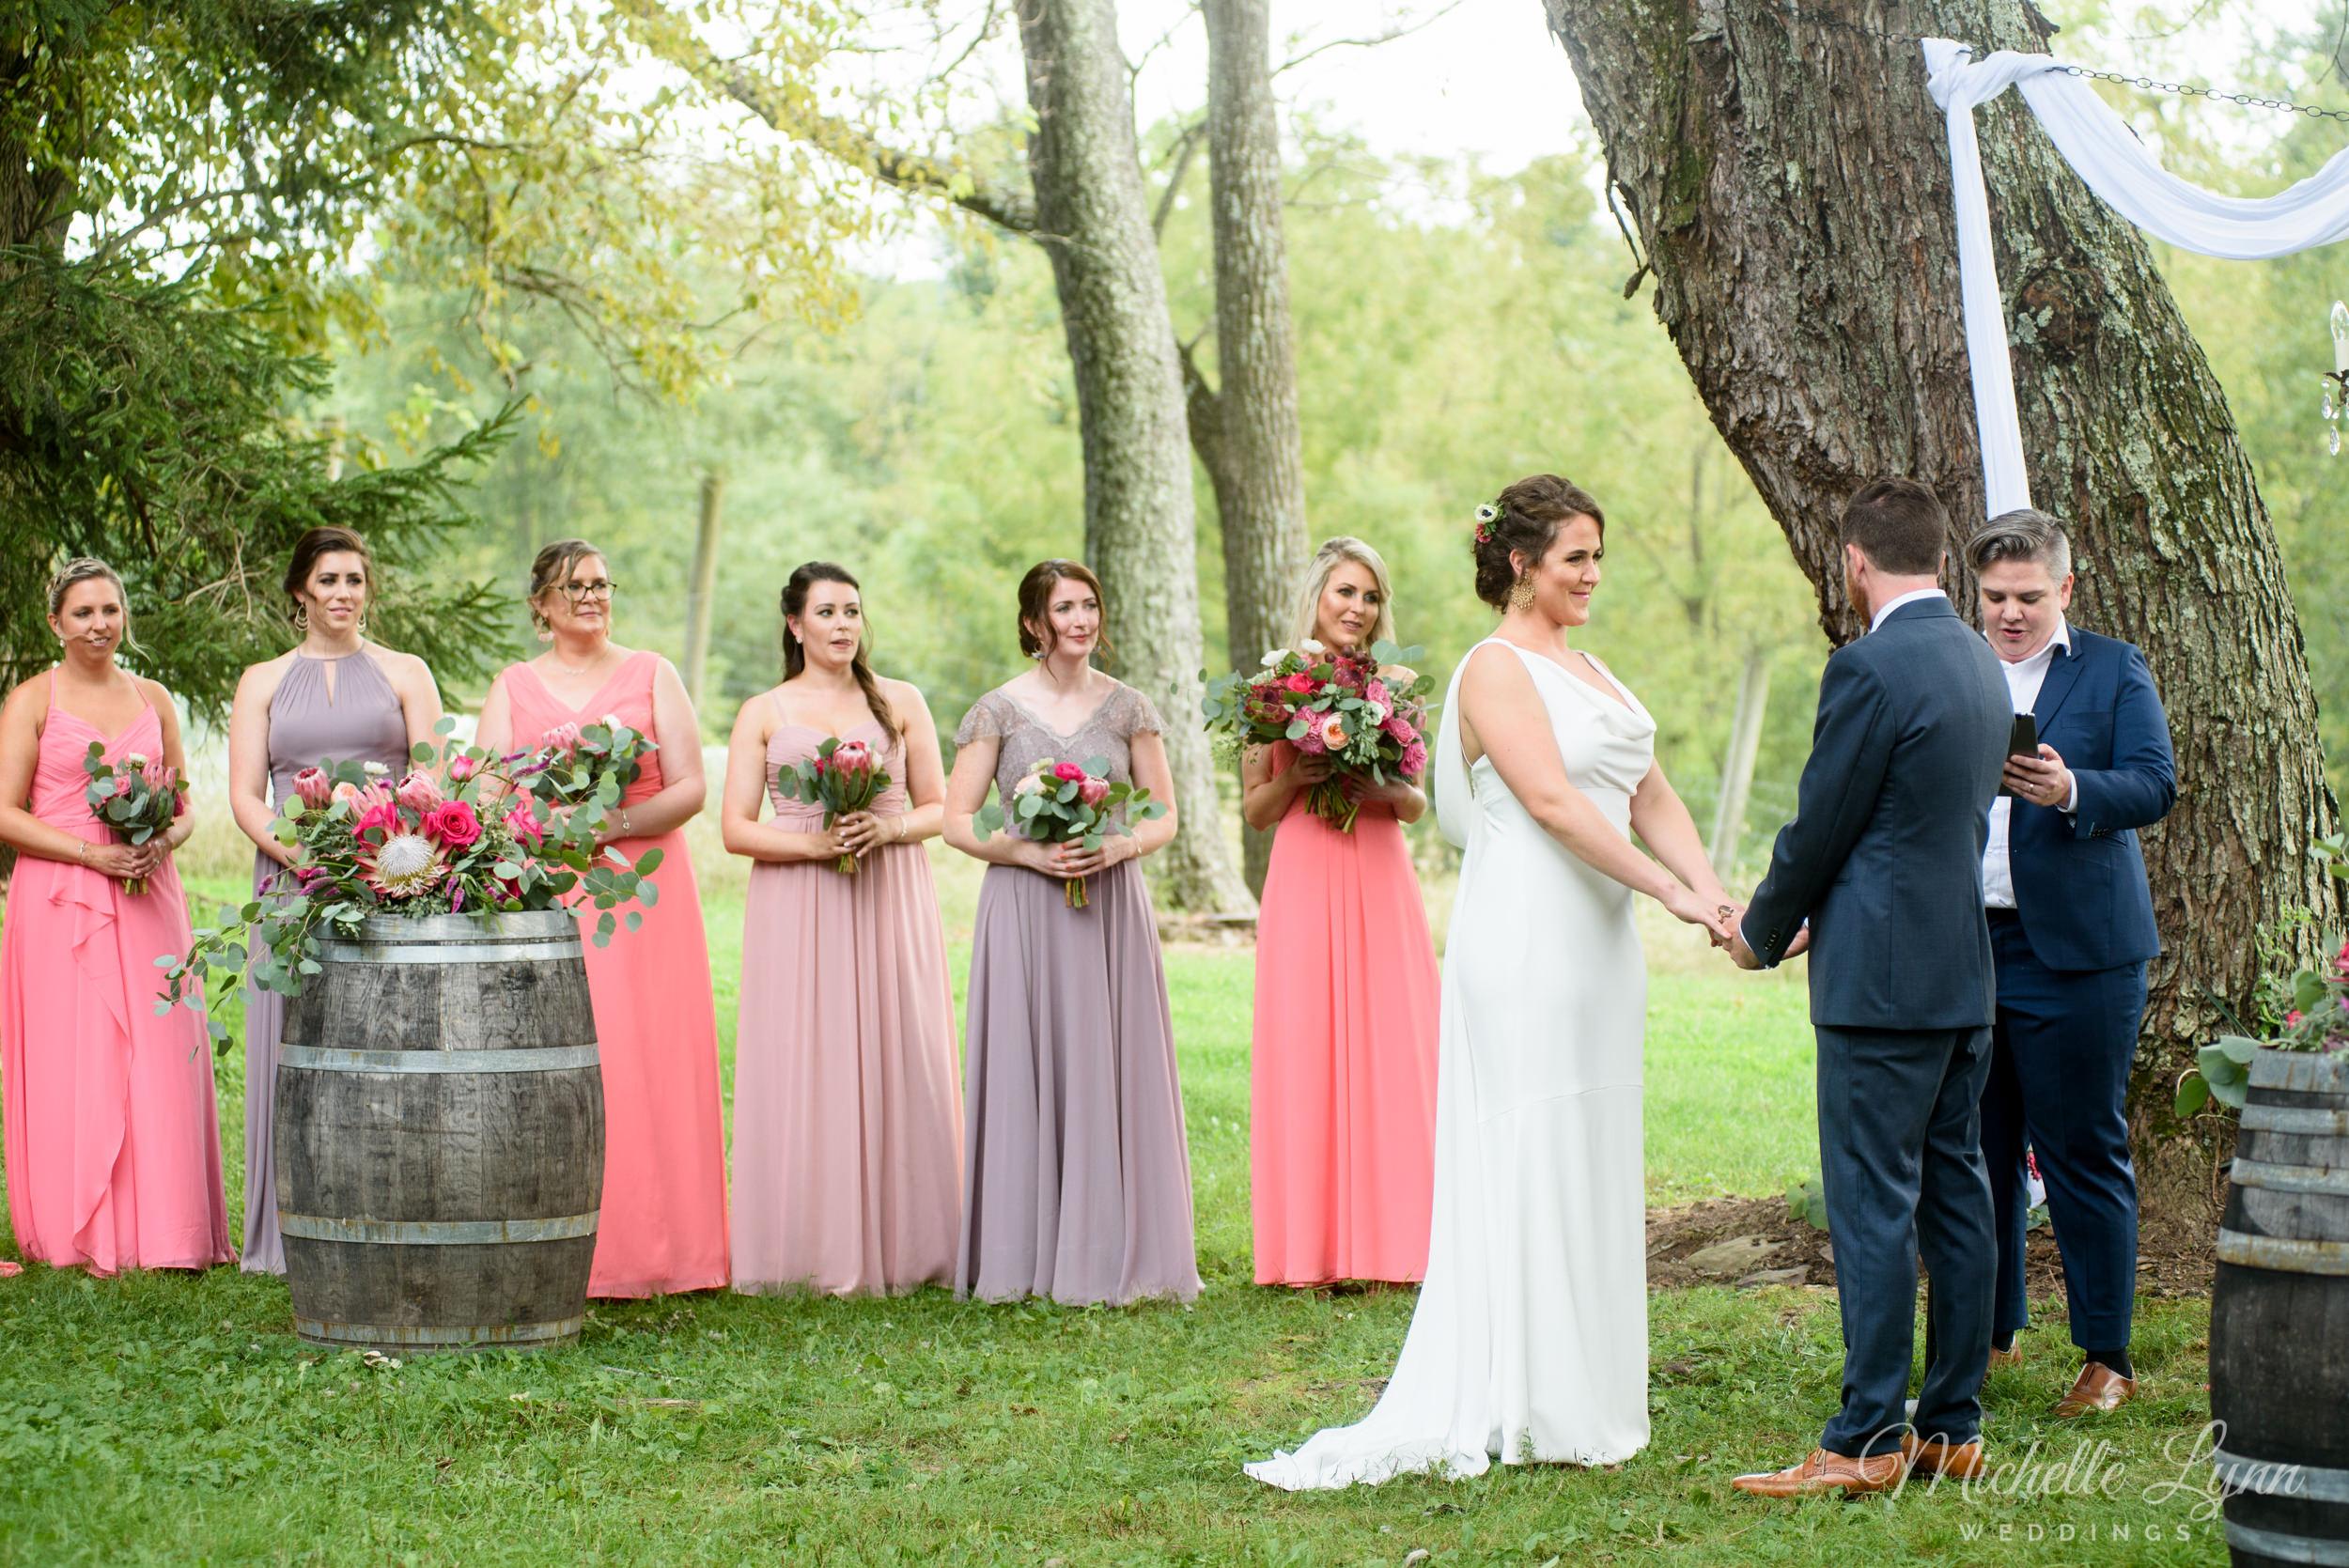 mlw-unionville-vineyards-nj-wedding-photography-37.jpg